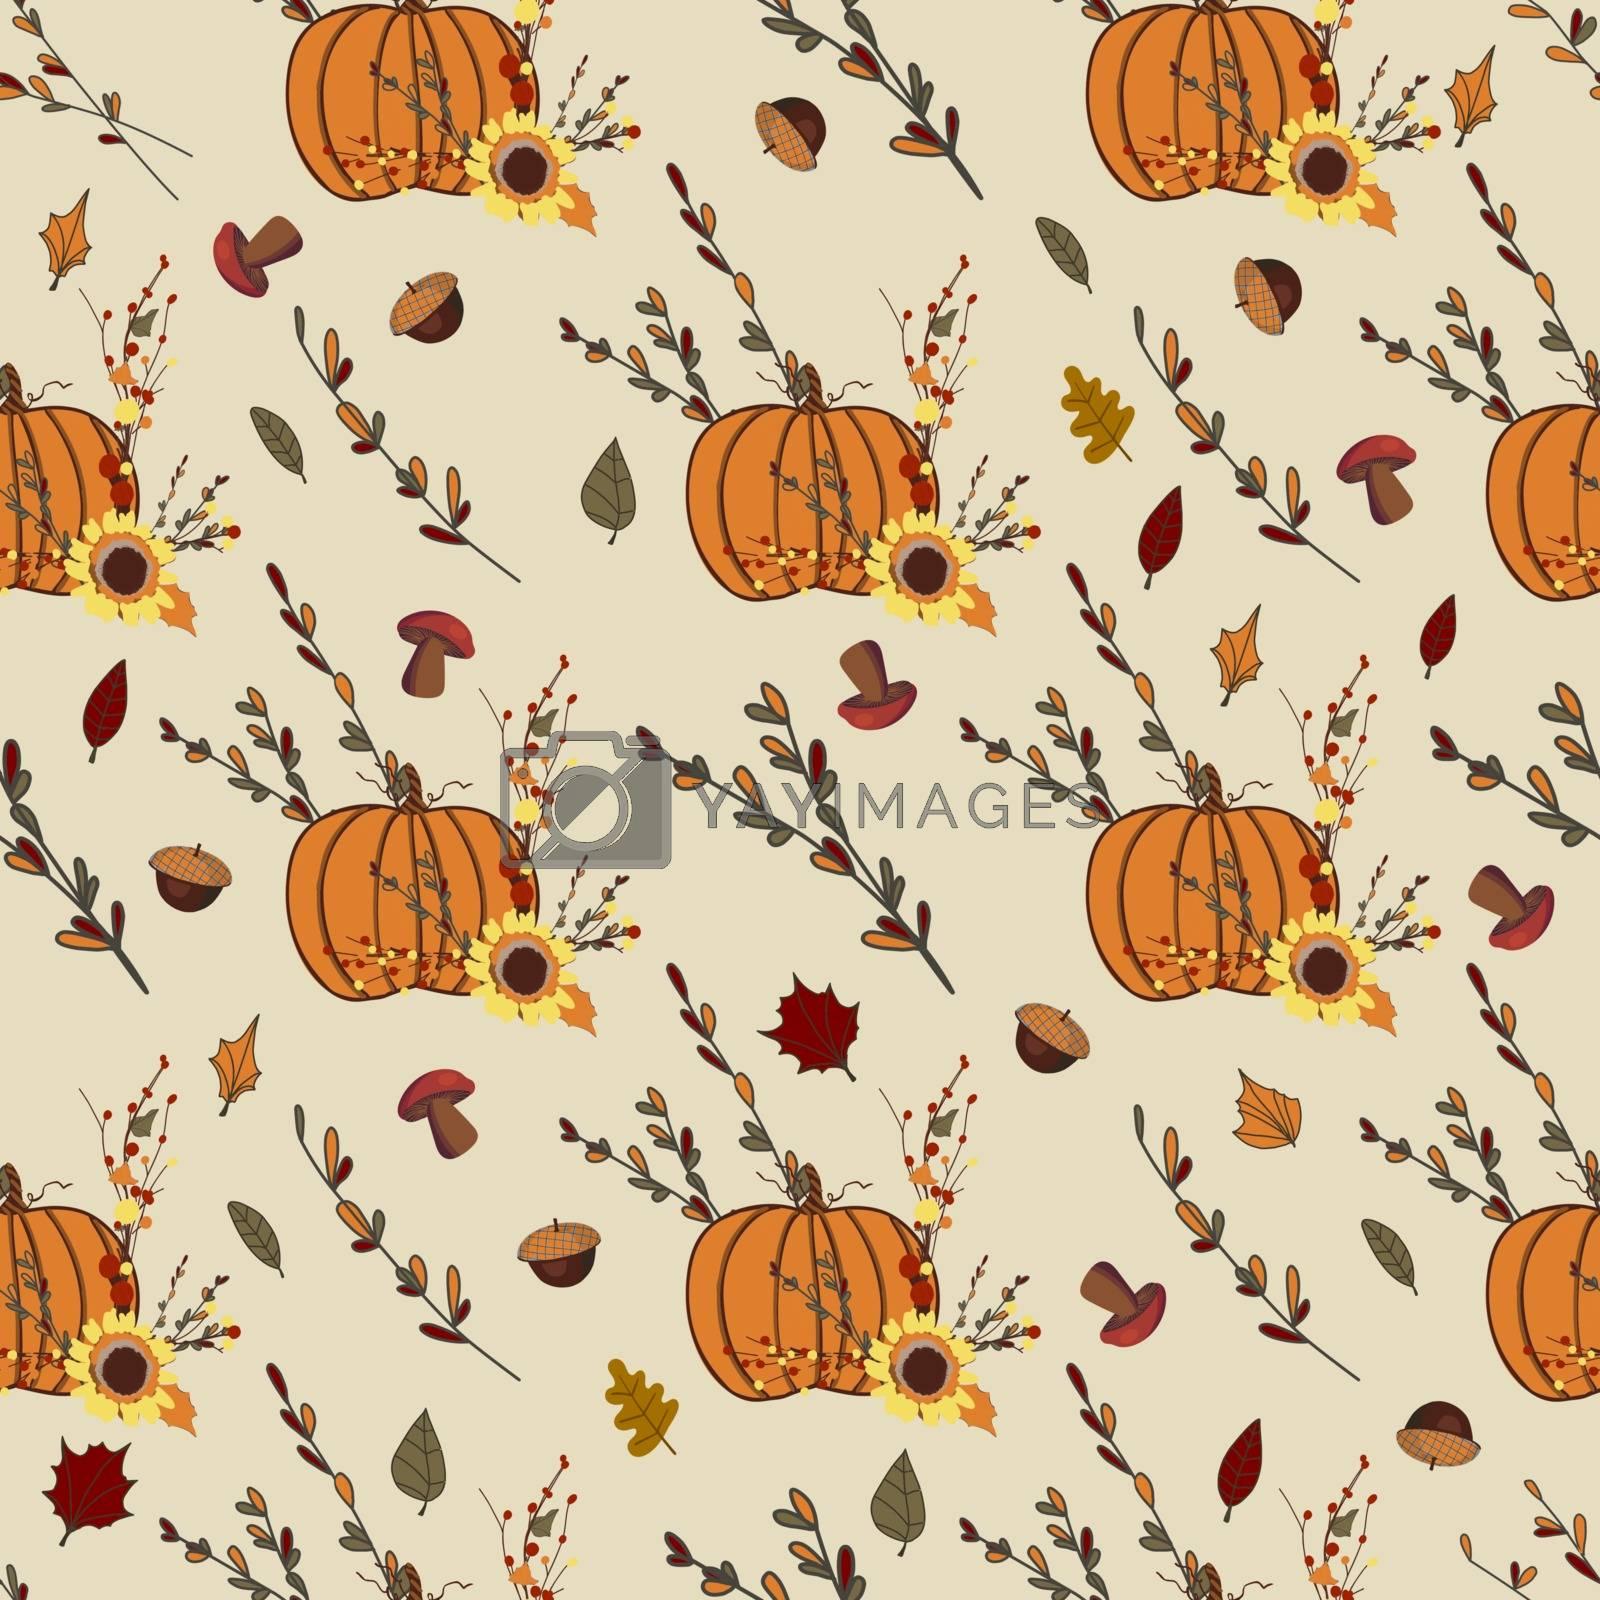 Autumn pattern with orange pumpkins. Thanksgiving design. Autumn composition.